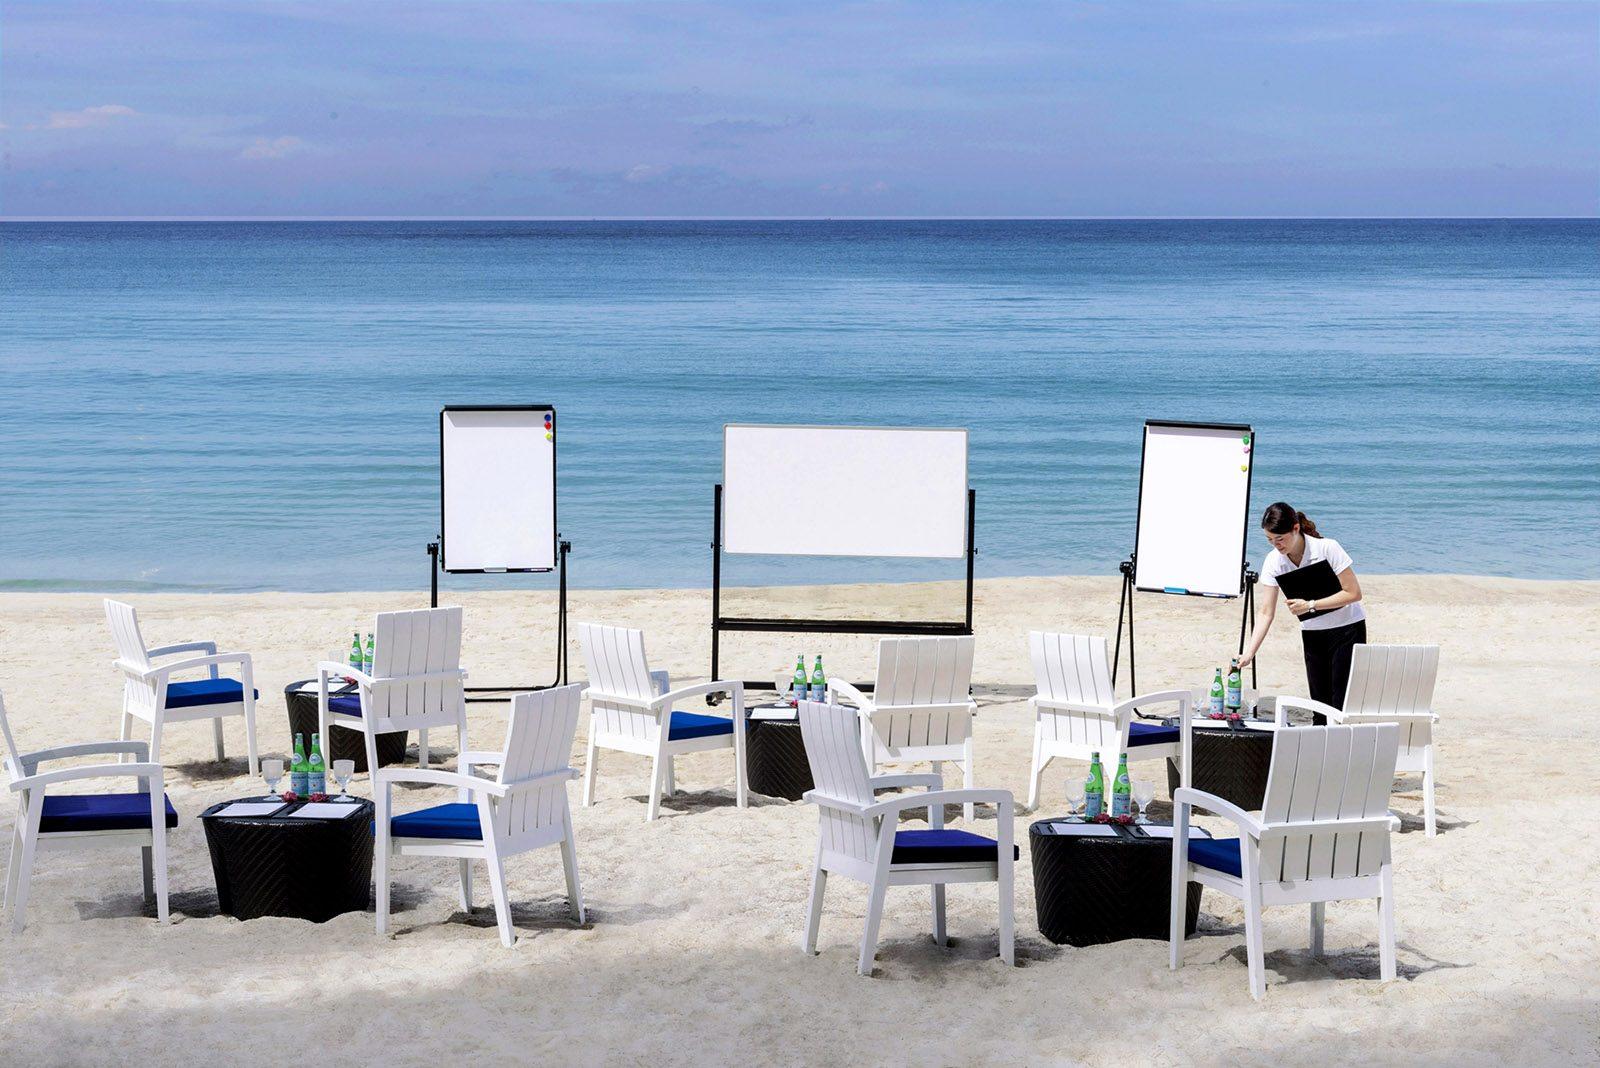 dusit thani laguna phuket - Meeting Retreat